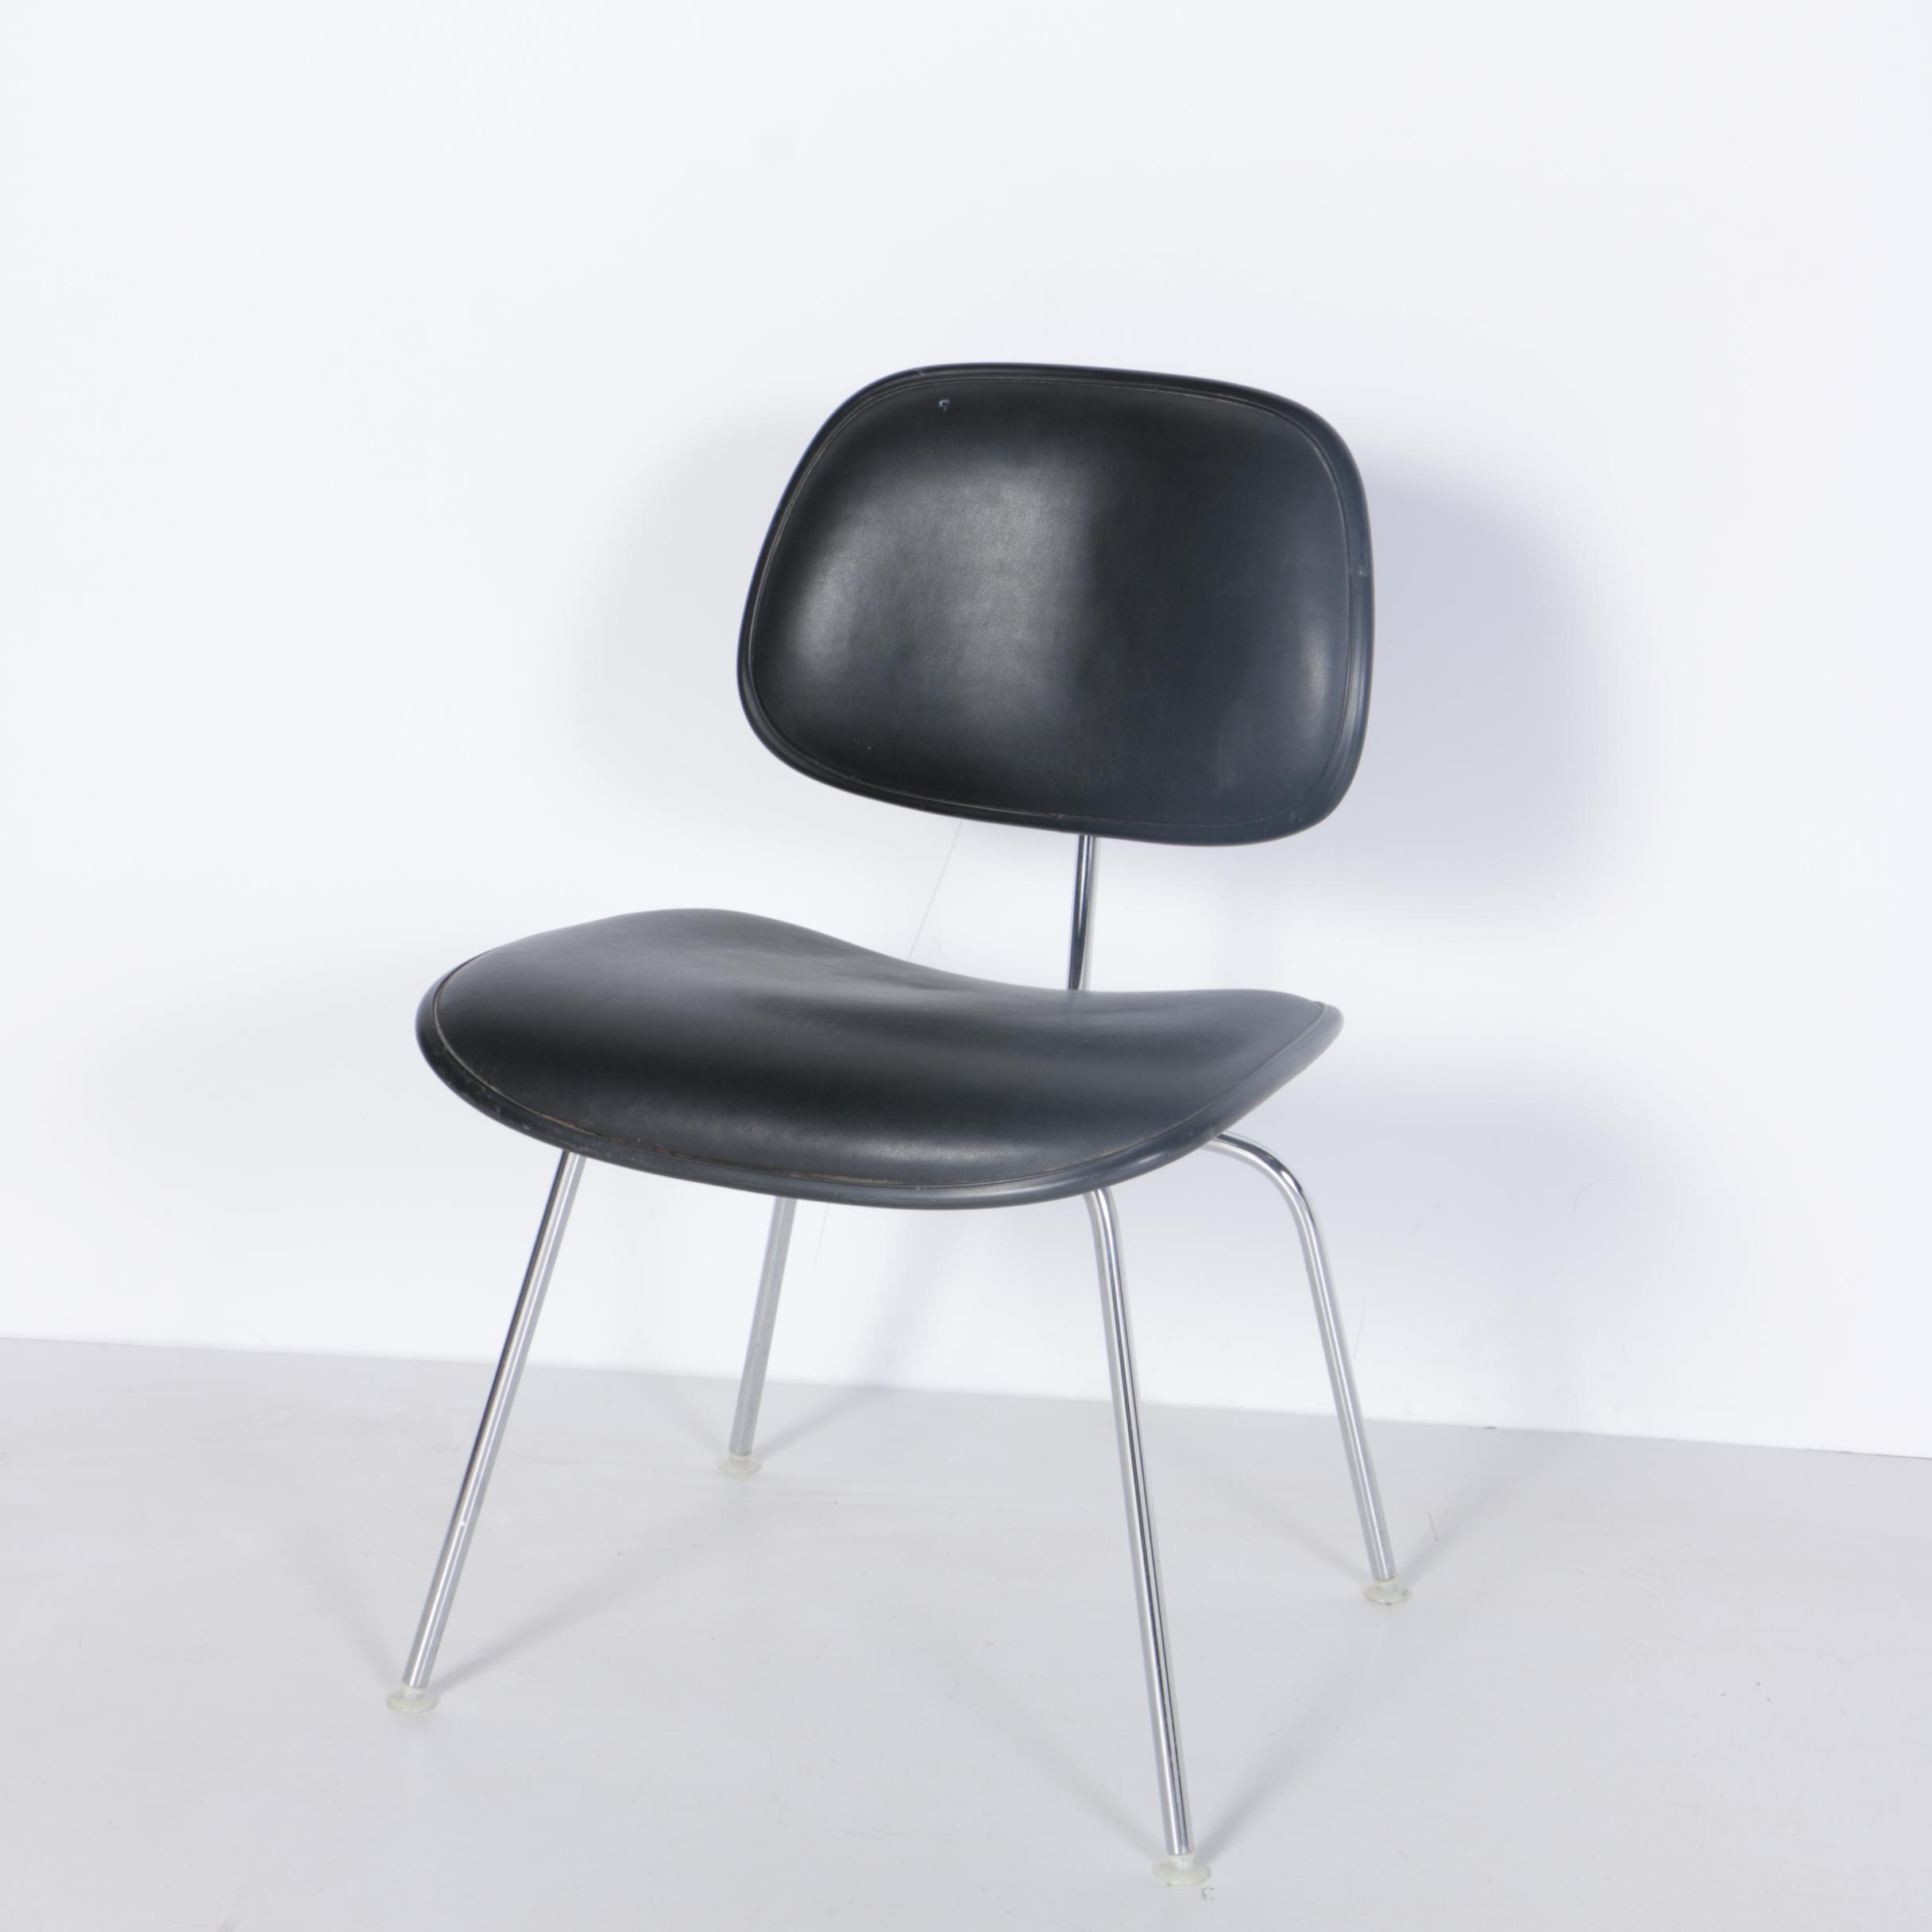 Vintage Eames for Herman Miller Mid Century Modern DCM Side Chair